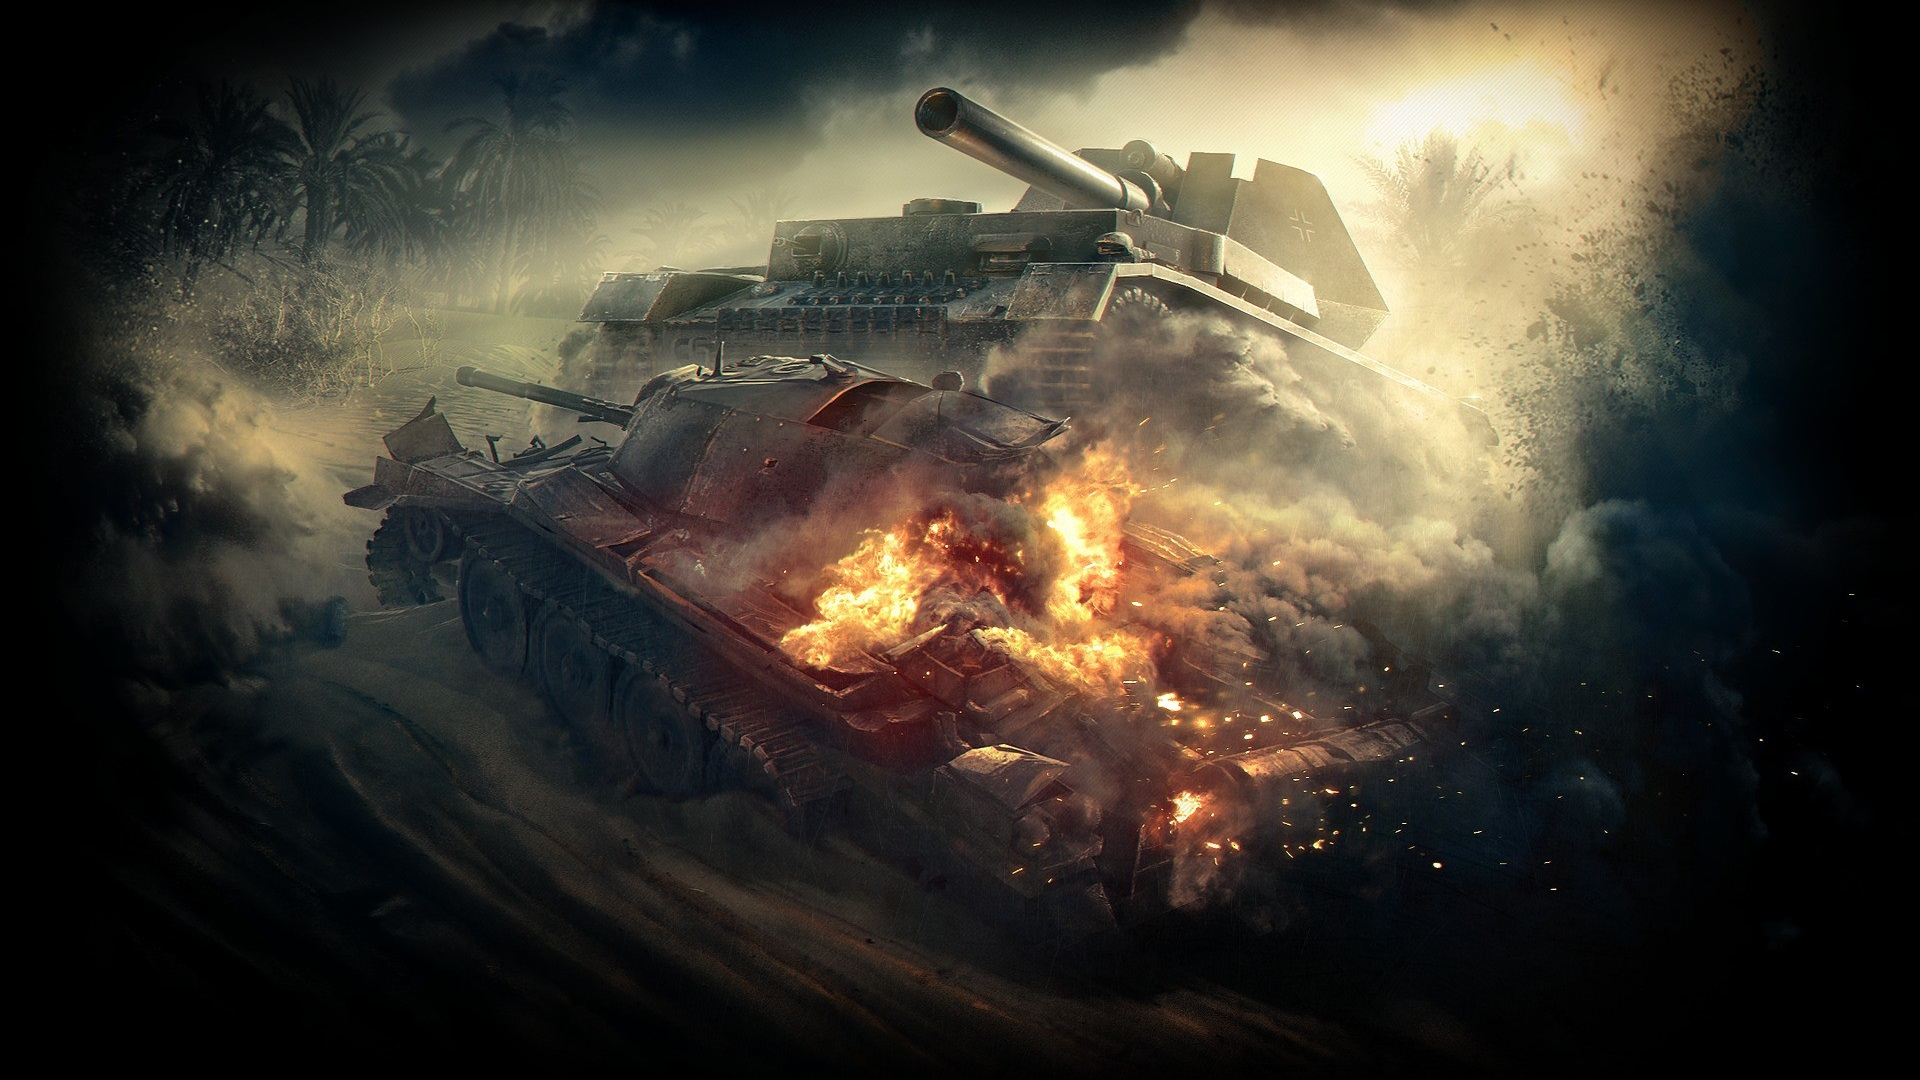 Download Wallpaper 1920x1080 World of Tanks, destroy Full ...